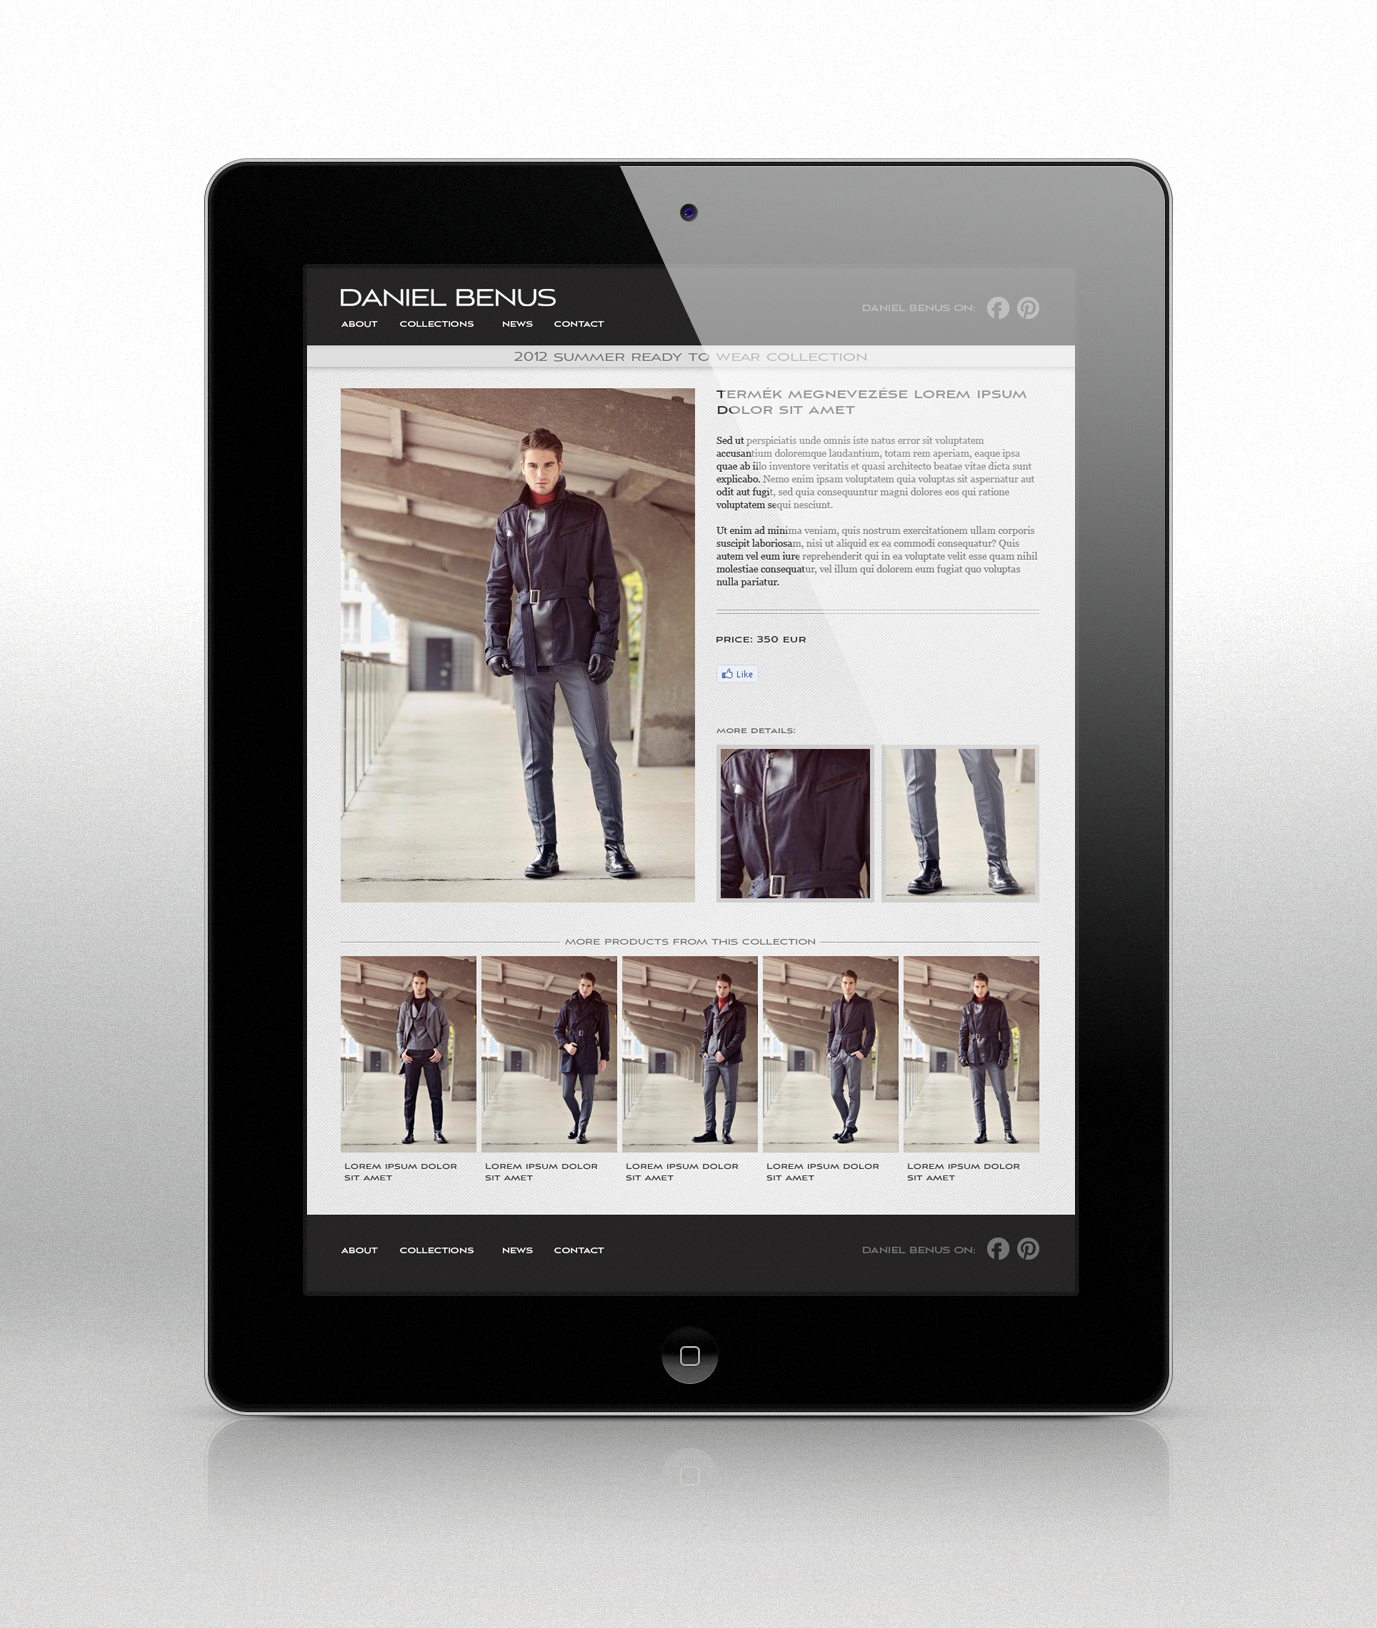 Daniel Benus website